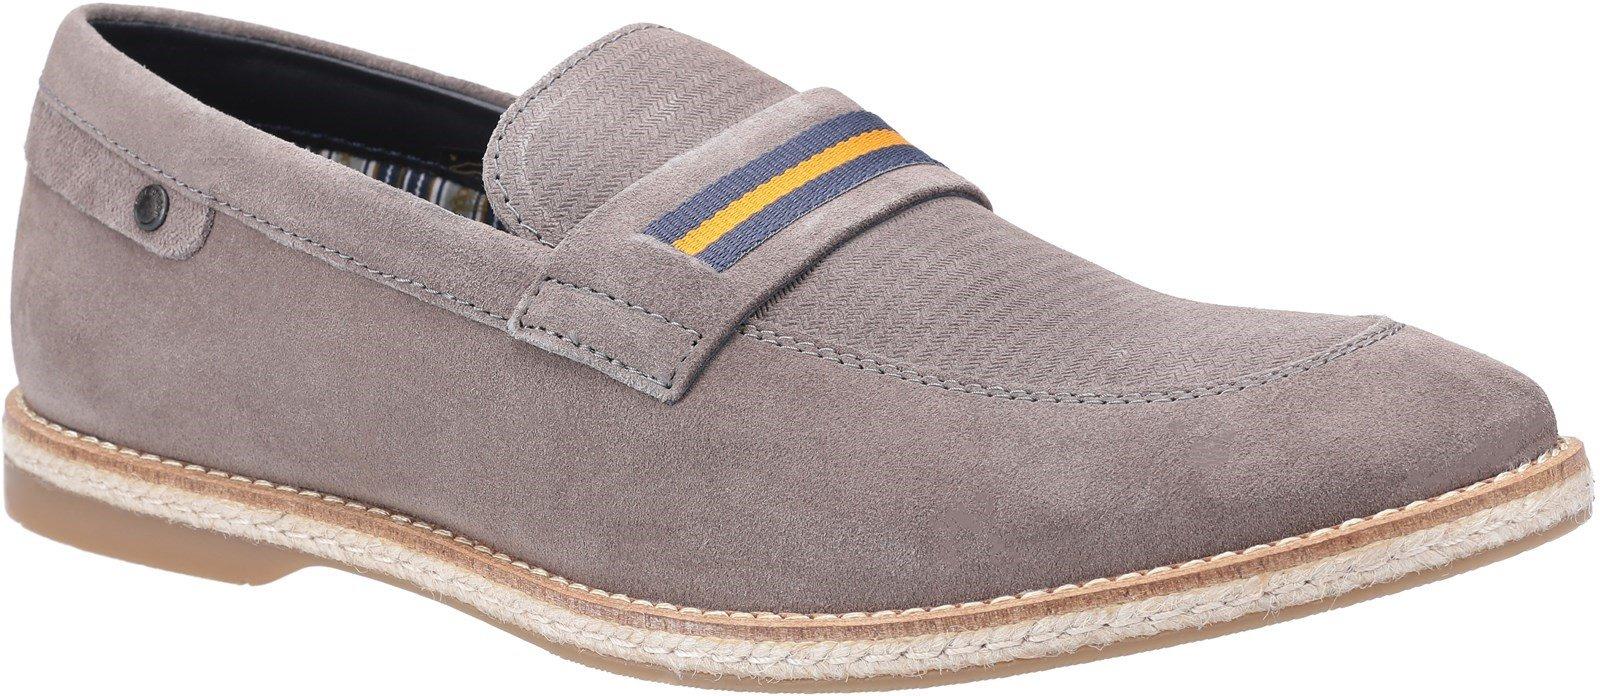 Base London Men's Kinsey Suede Slip On Loafer Various Colours 30444 - Grey 6